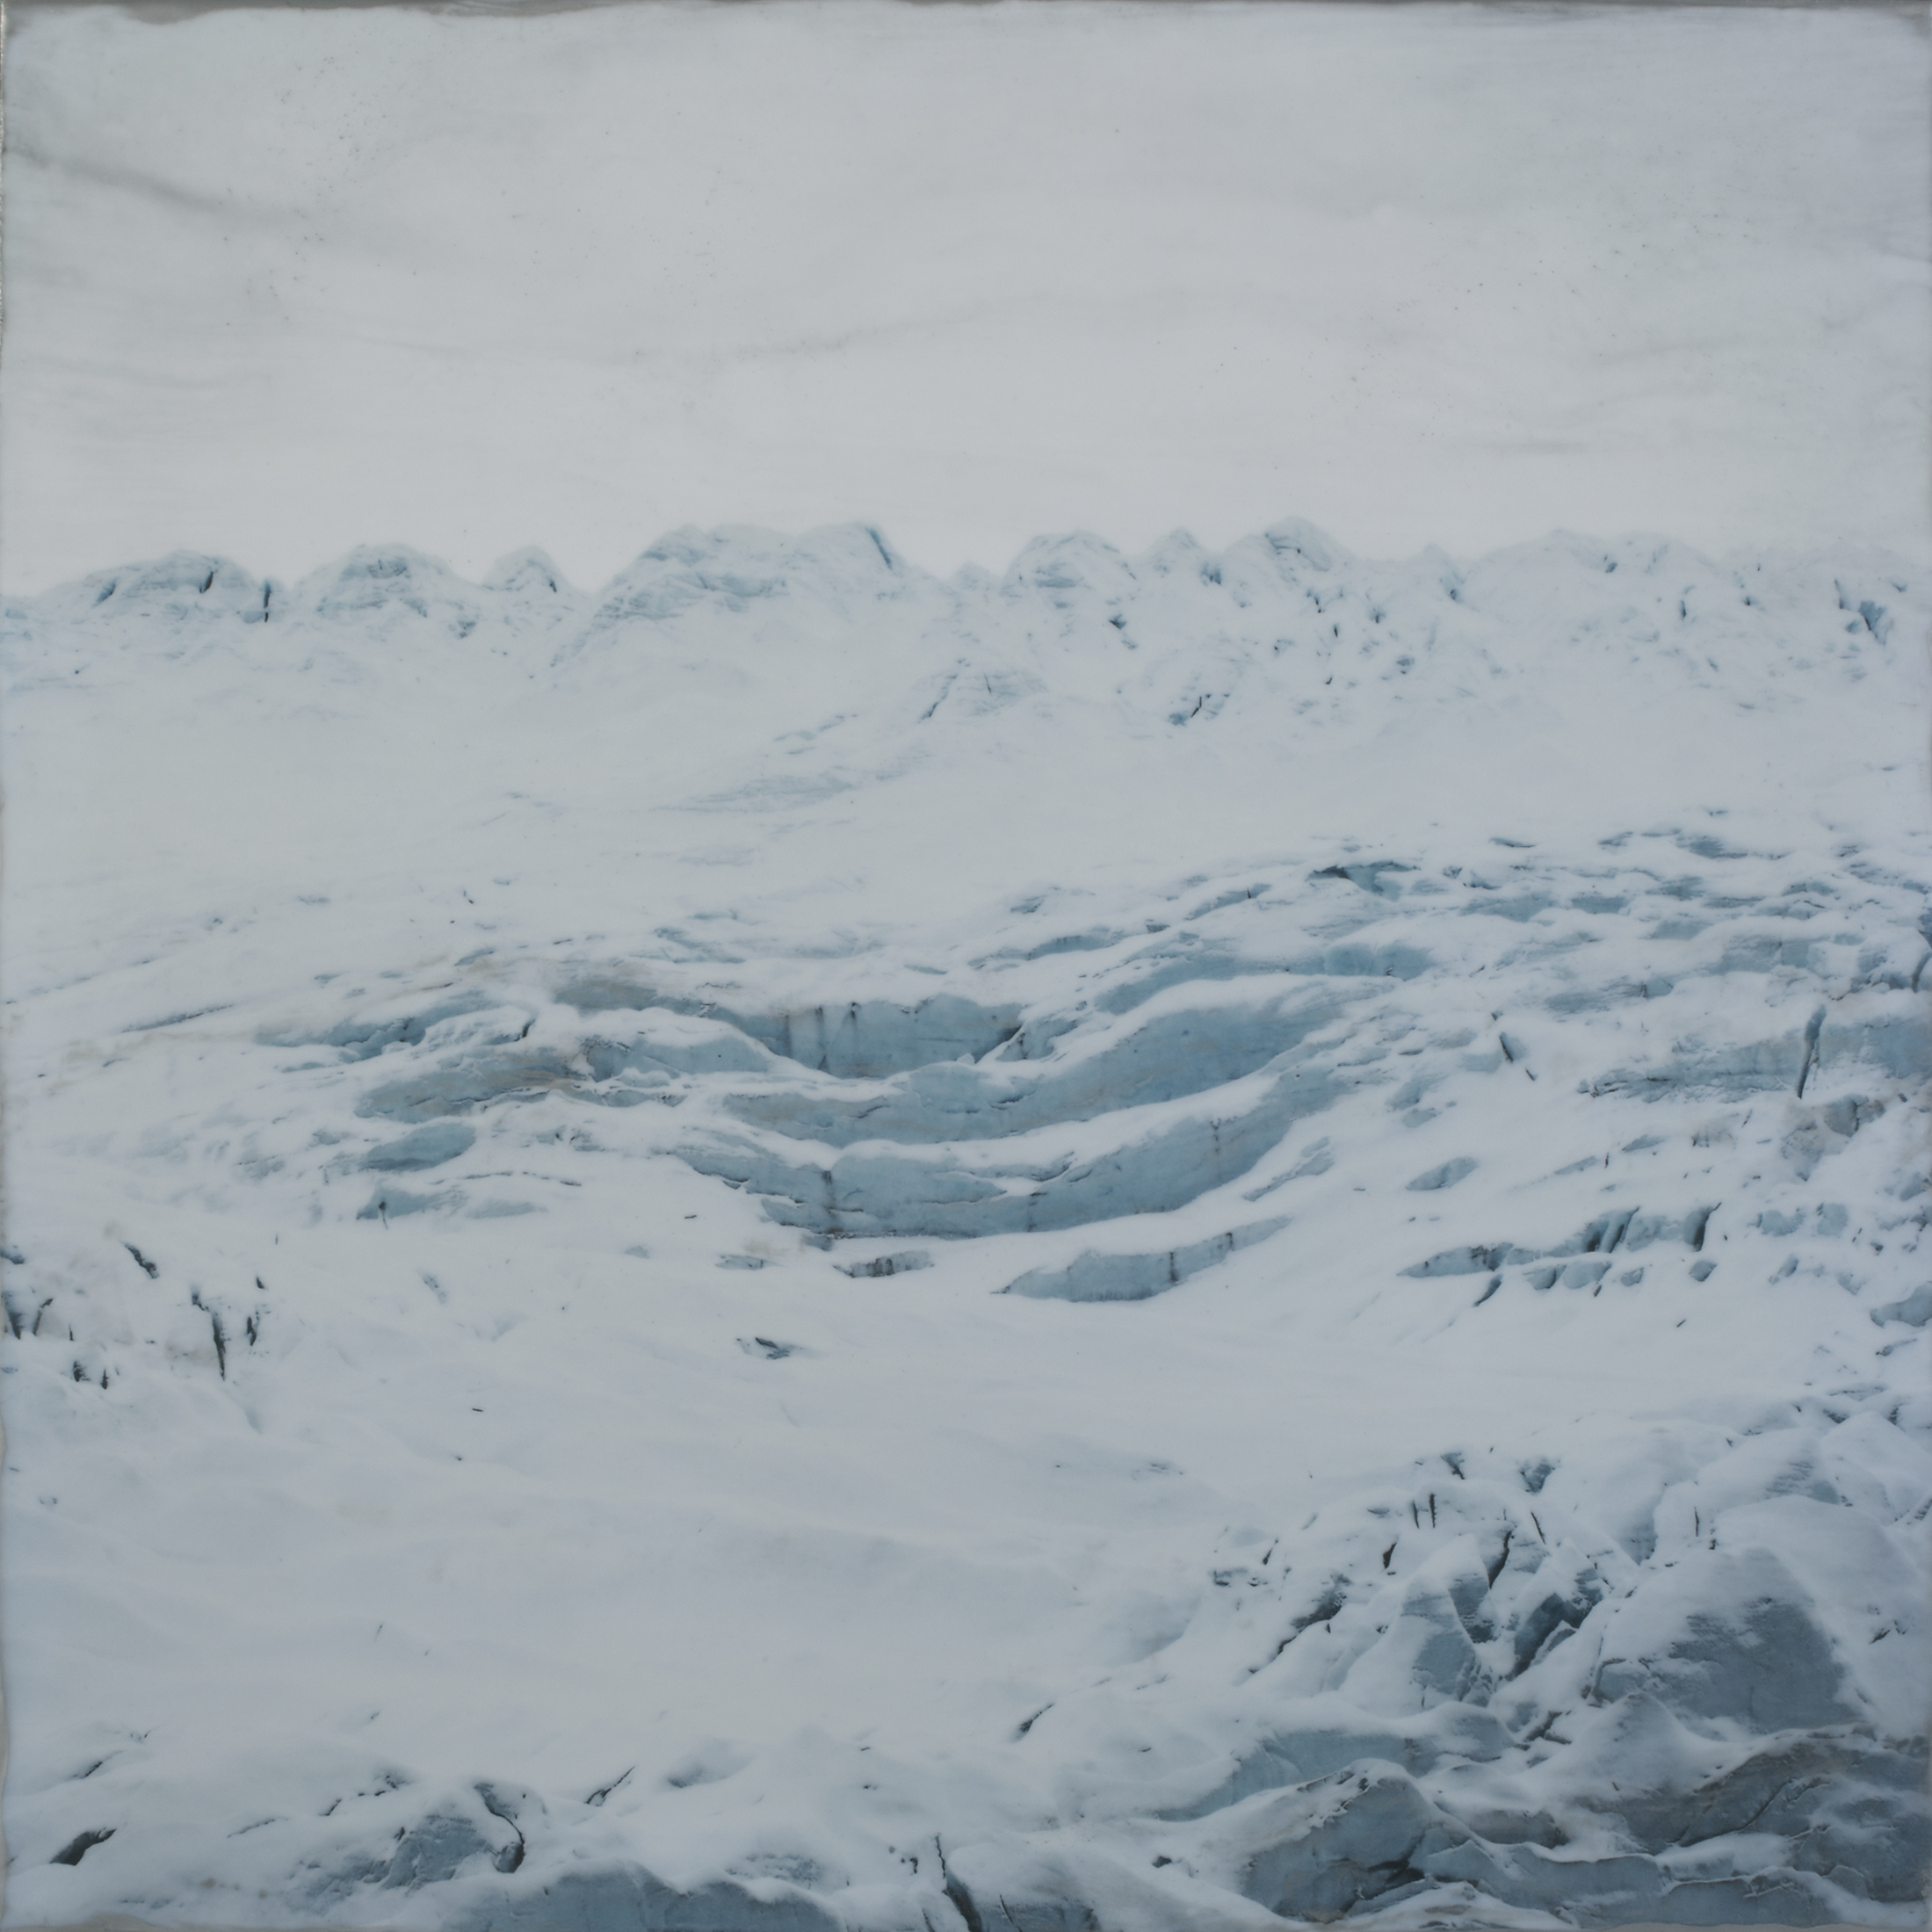 Glacier Terminus #2